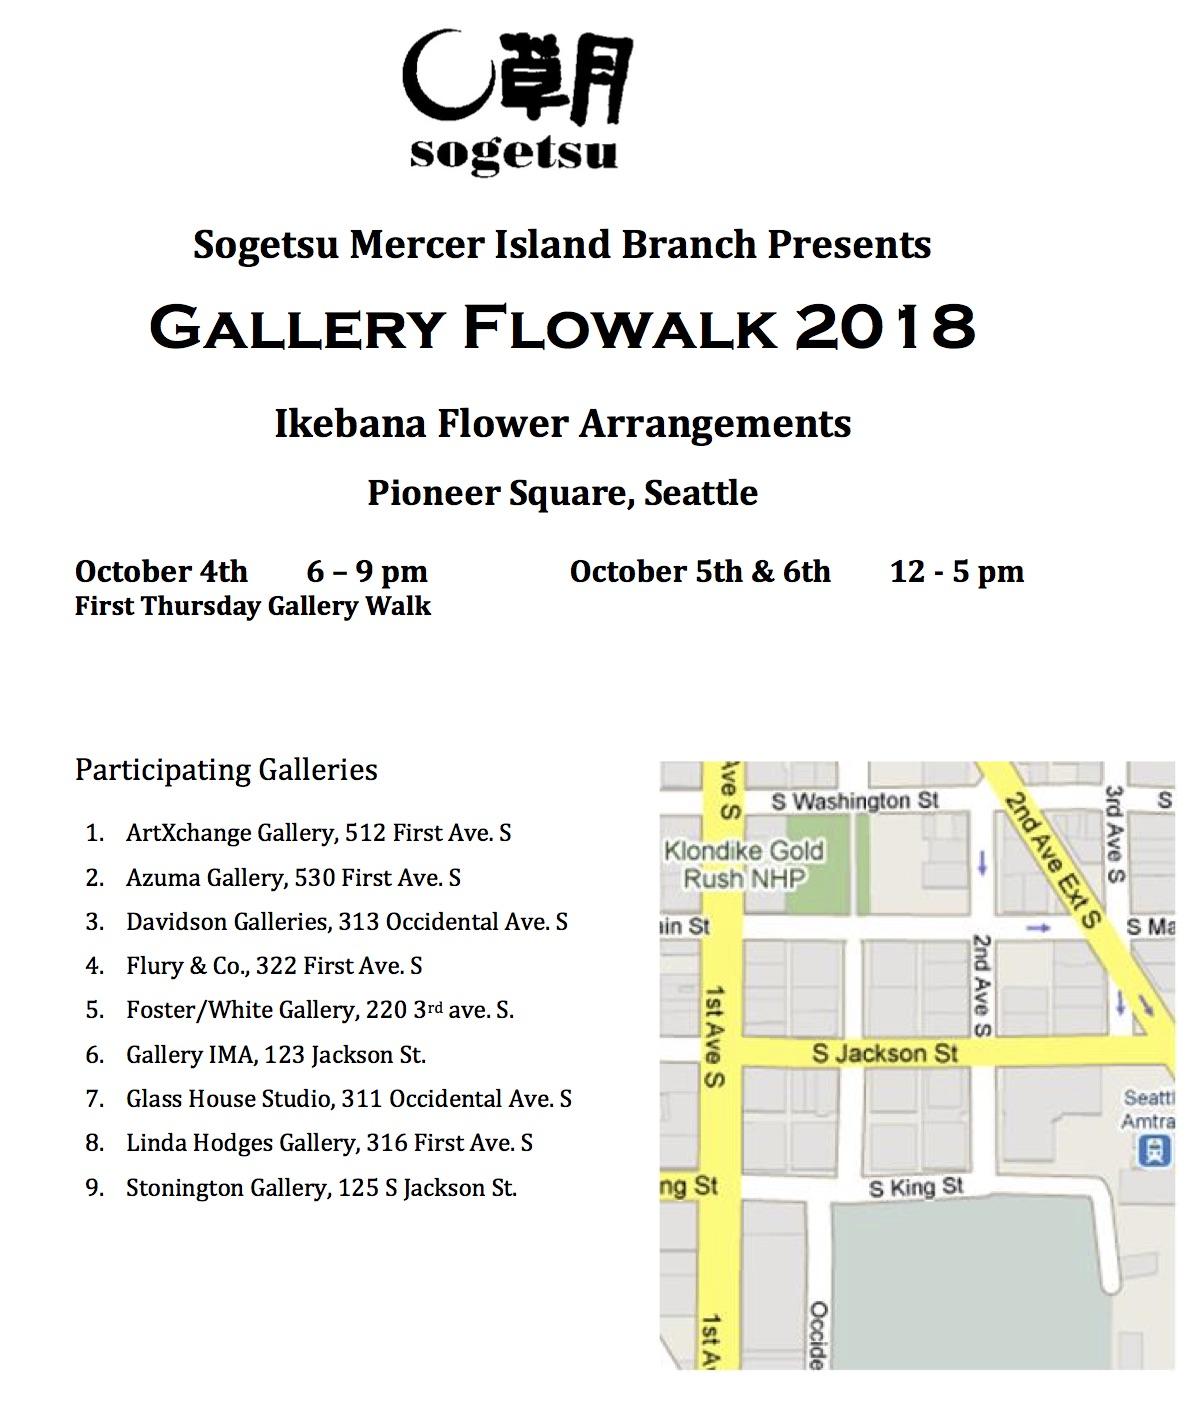 Gallery Flowalk by Sogetsu Mercer Island Branch – Ikebana